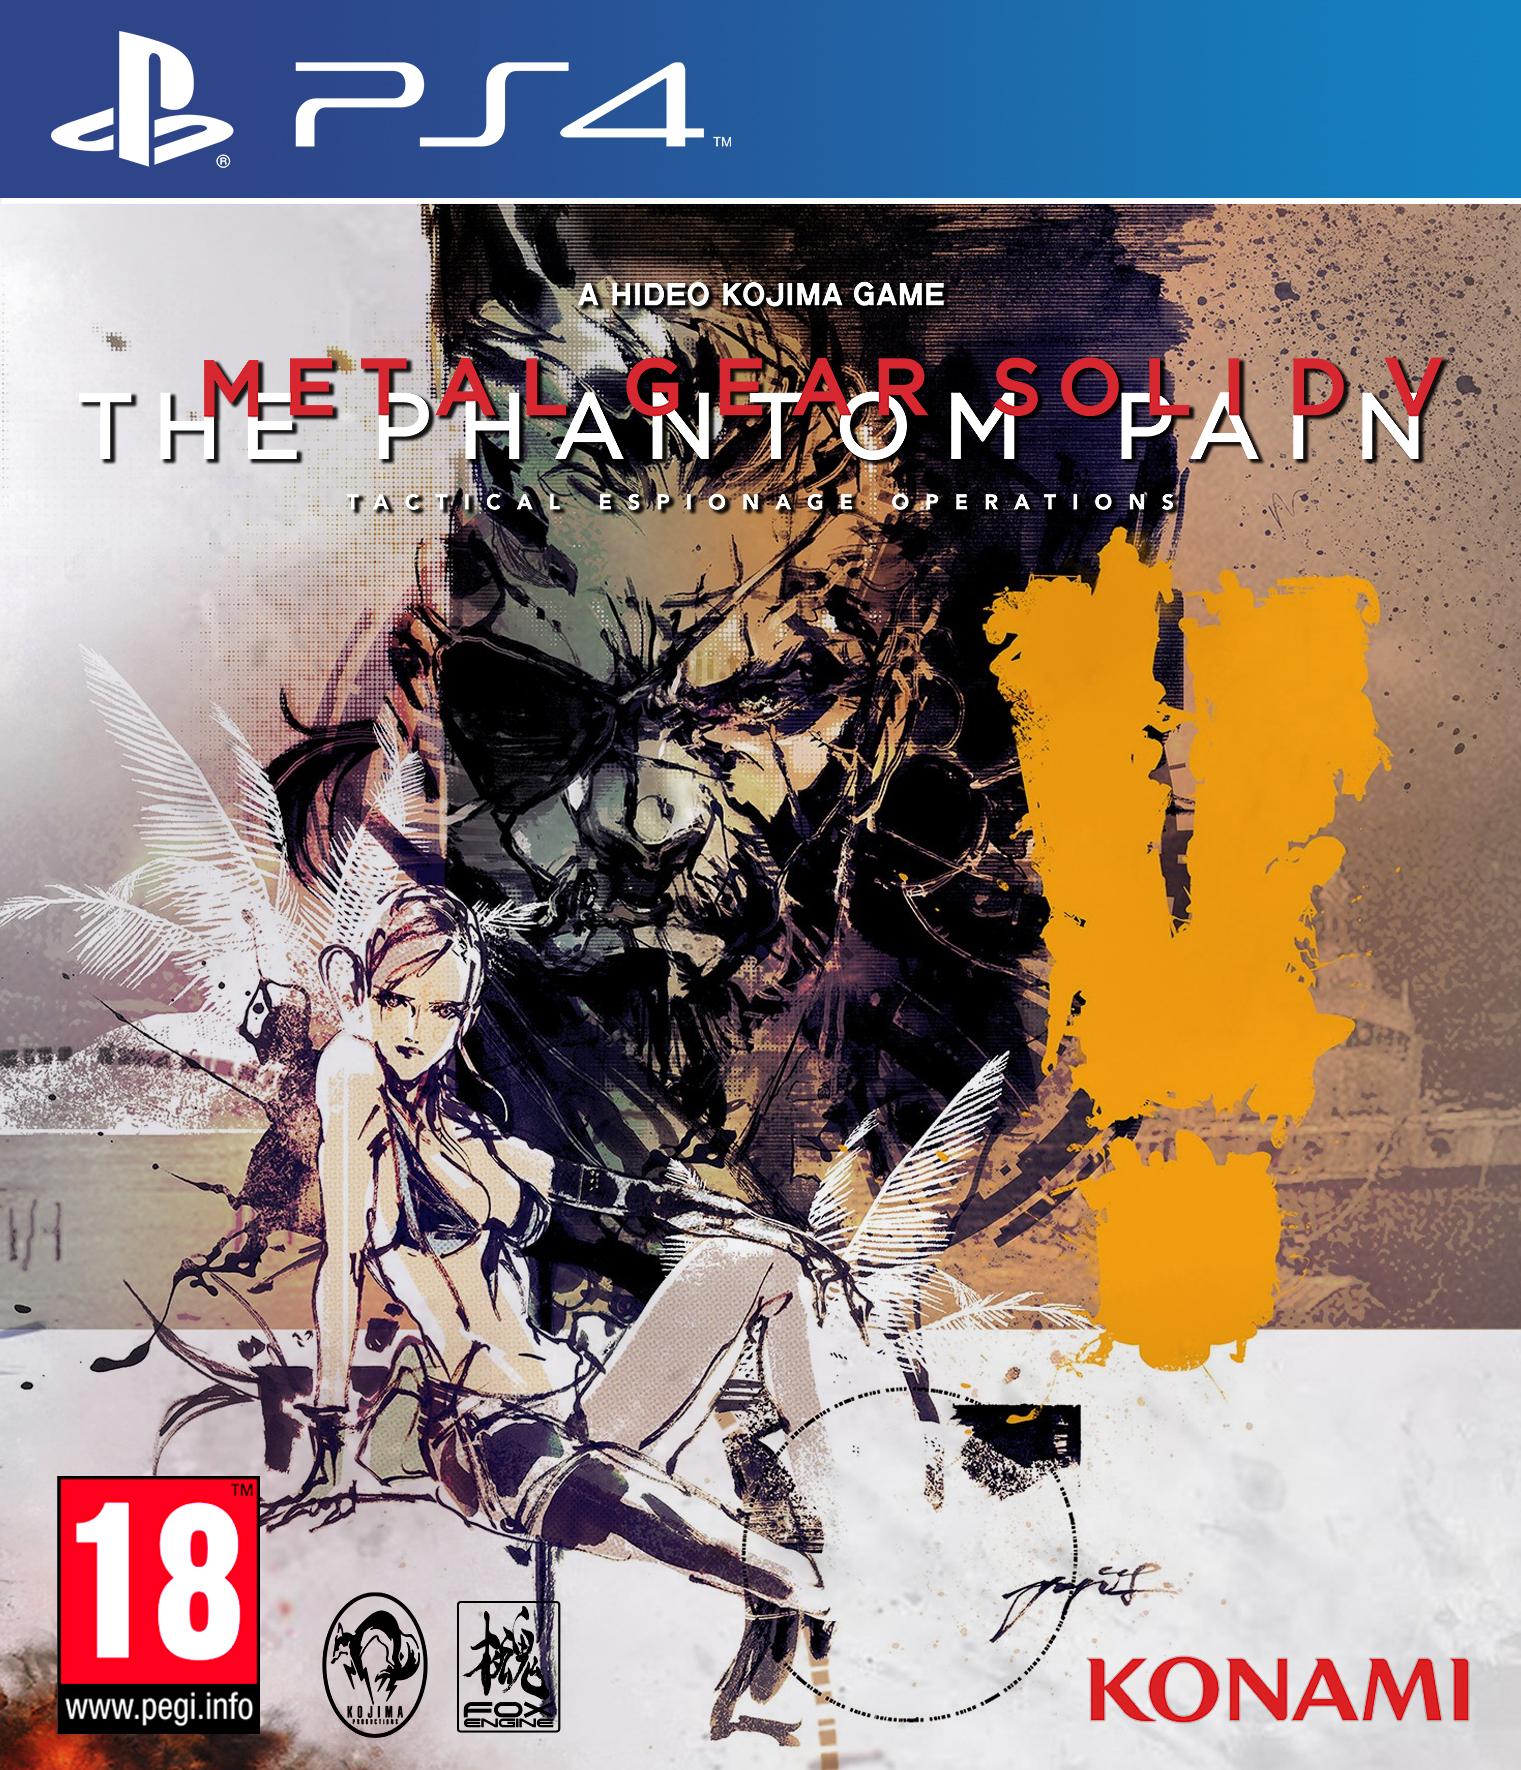 A New TPP PS4 PAL Front Cover Using The New Shinkawa Art